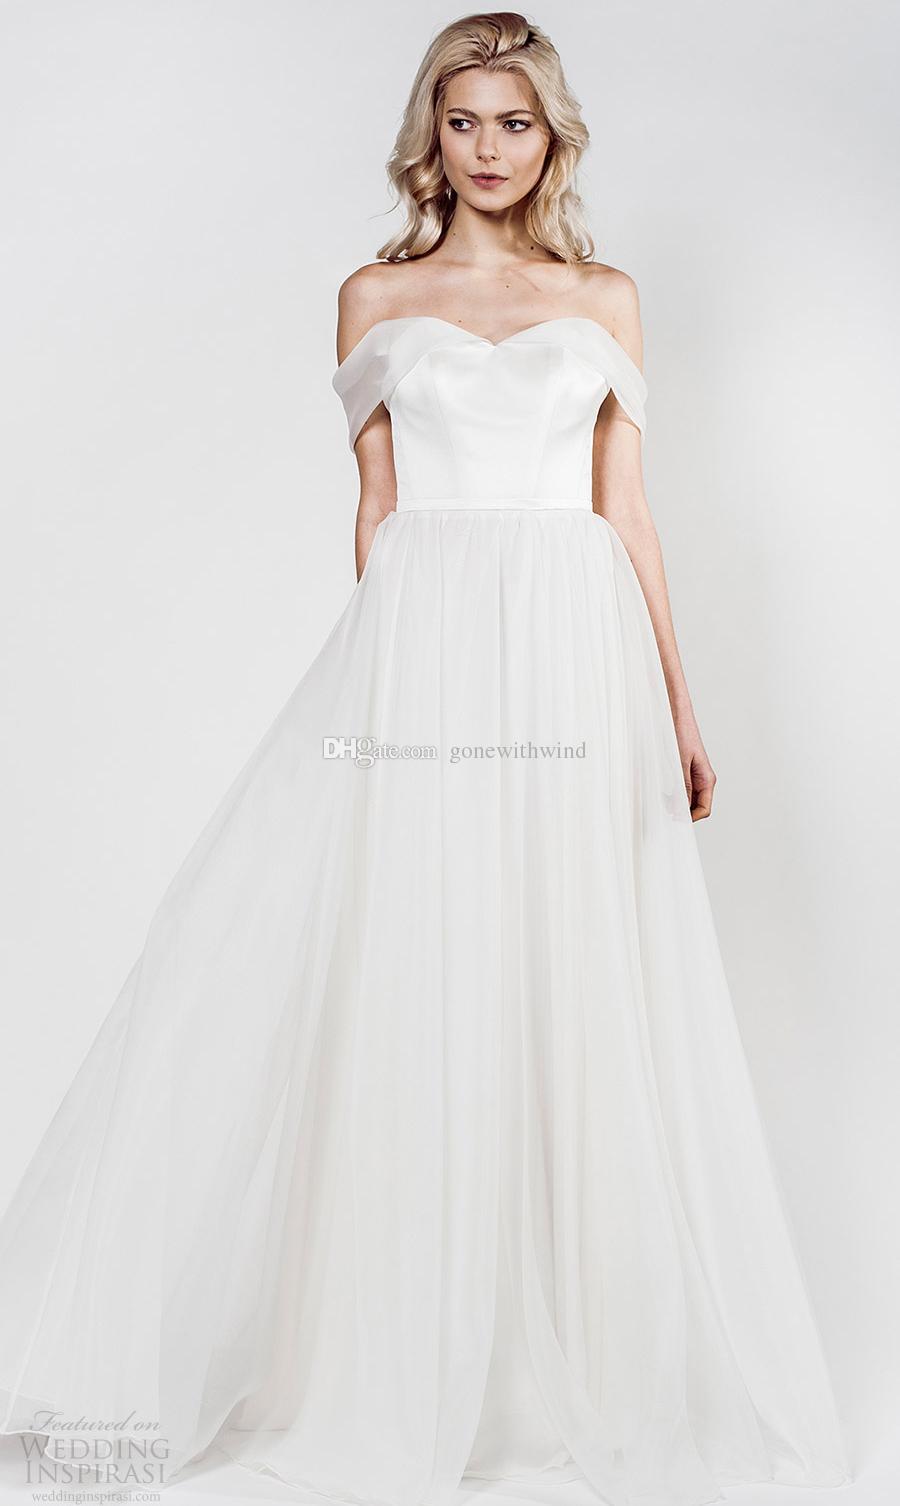 Simple White Ball Gown Wedding Dresses 2017 Aida Kapociute Bridal ...